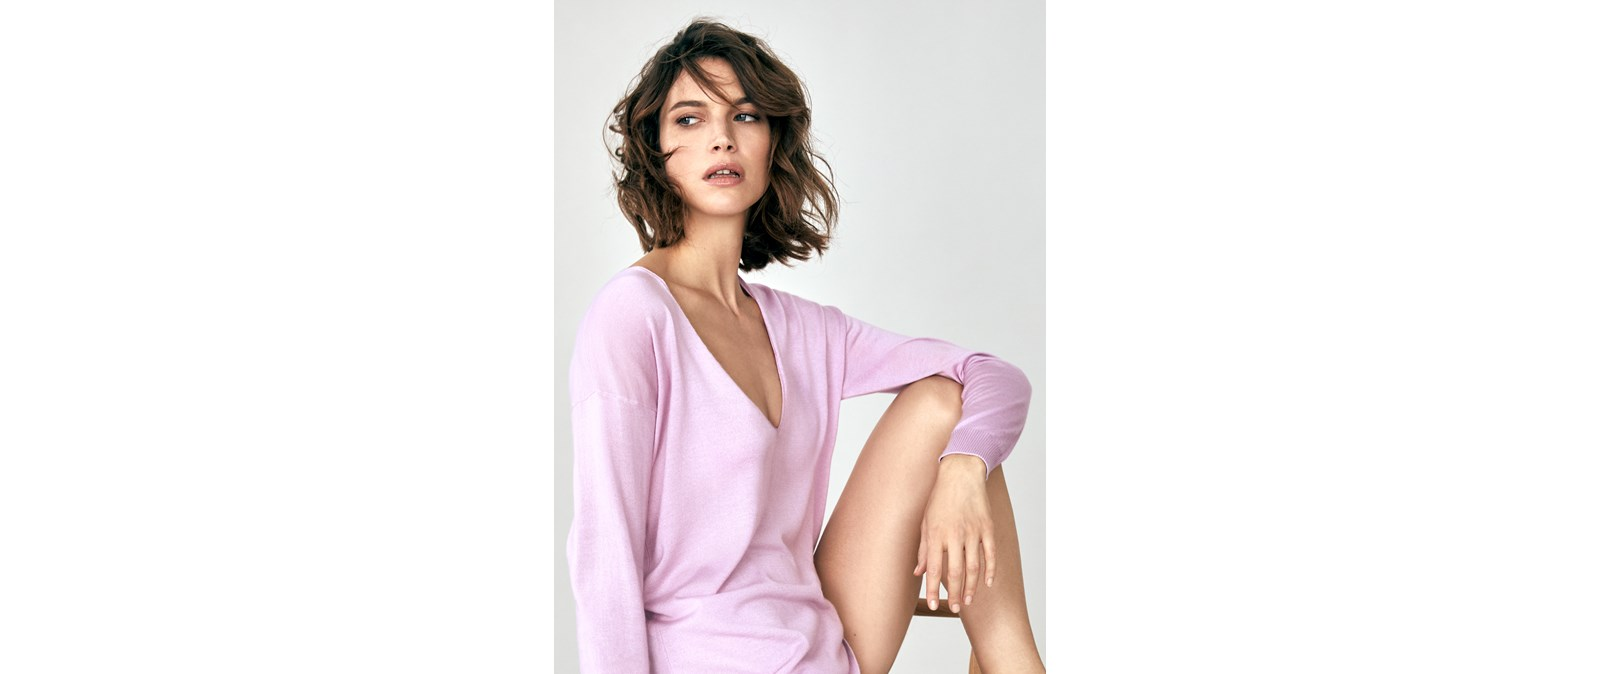 10b96a750408 Η Spring/Summer 2019 συλλογή του Falconeri είναι αφιερωμένη στη σύγχρονη  γυναίκα